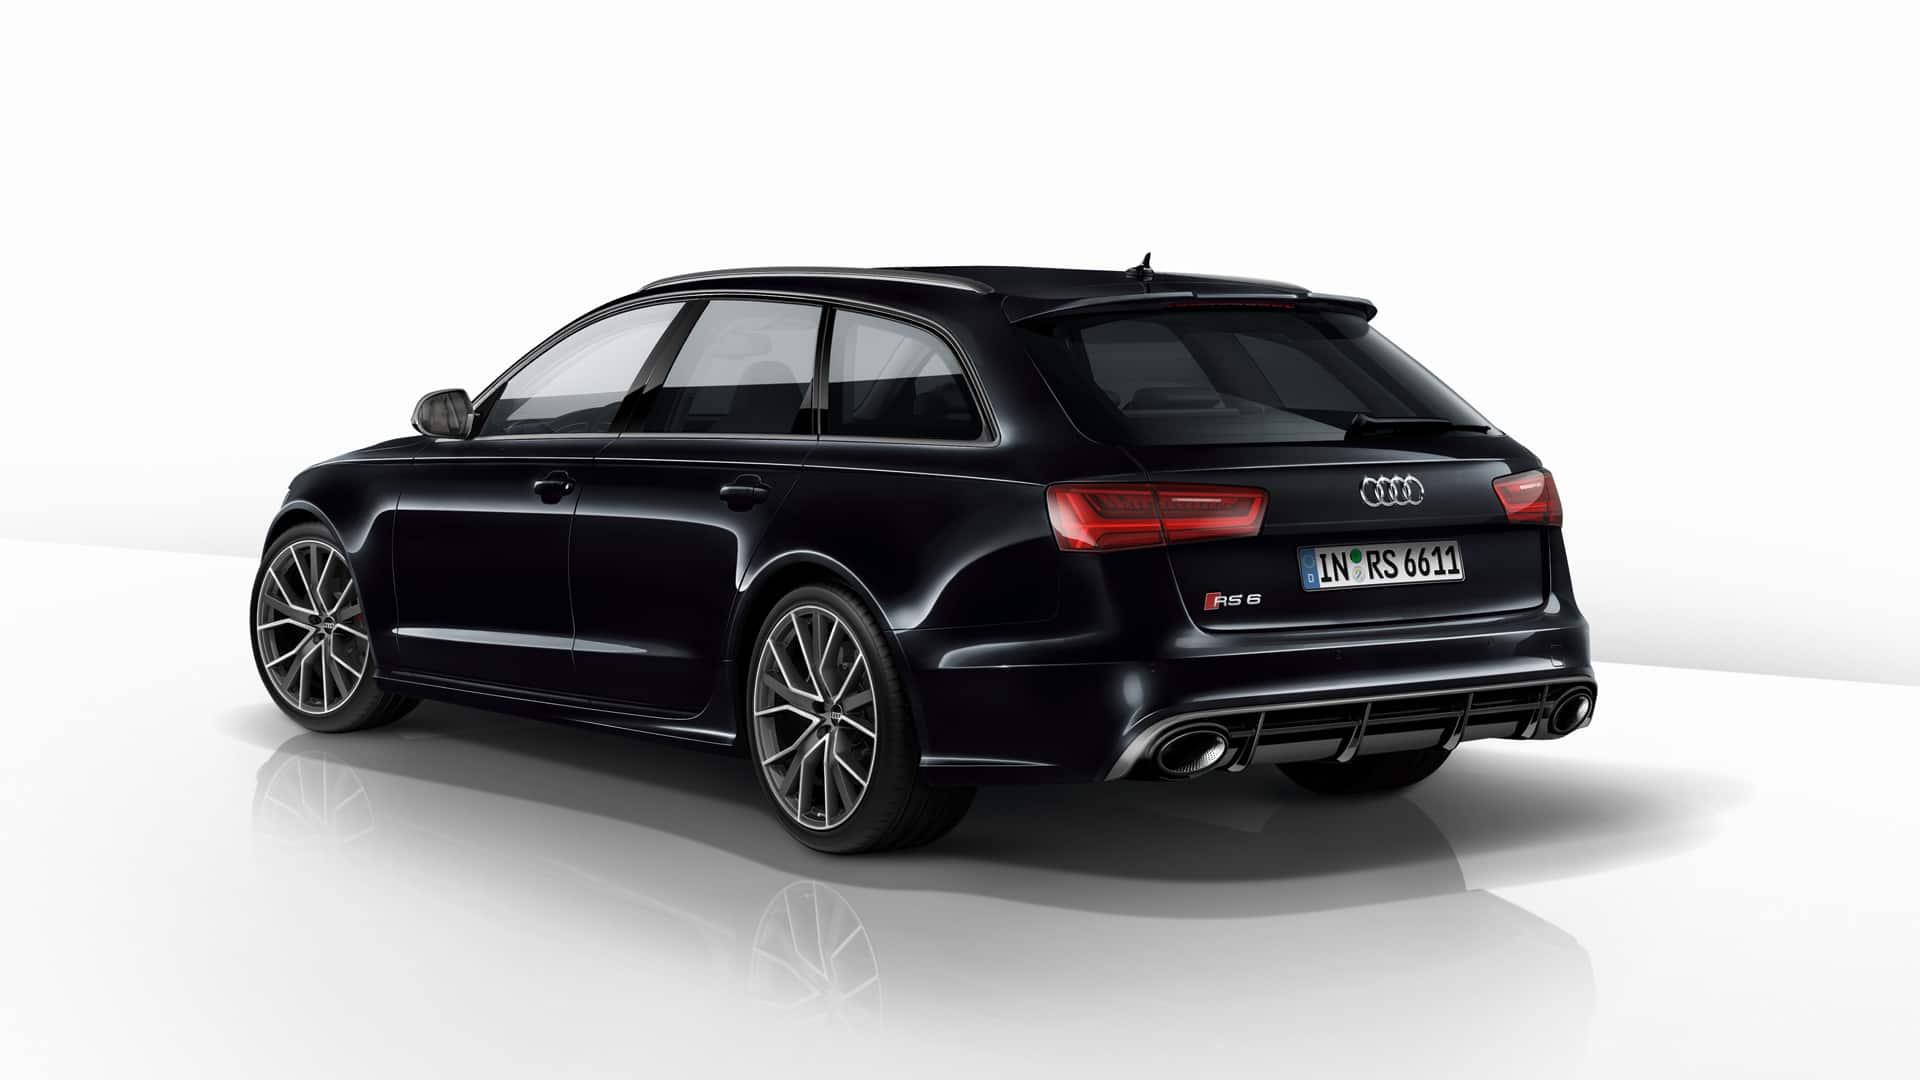 Rs 6 Avant Gt A6 Gt Audi Deutschland